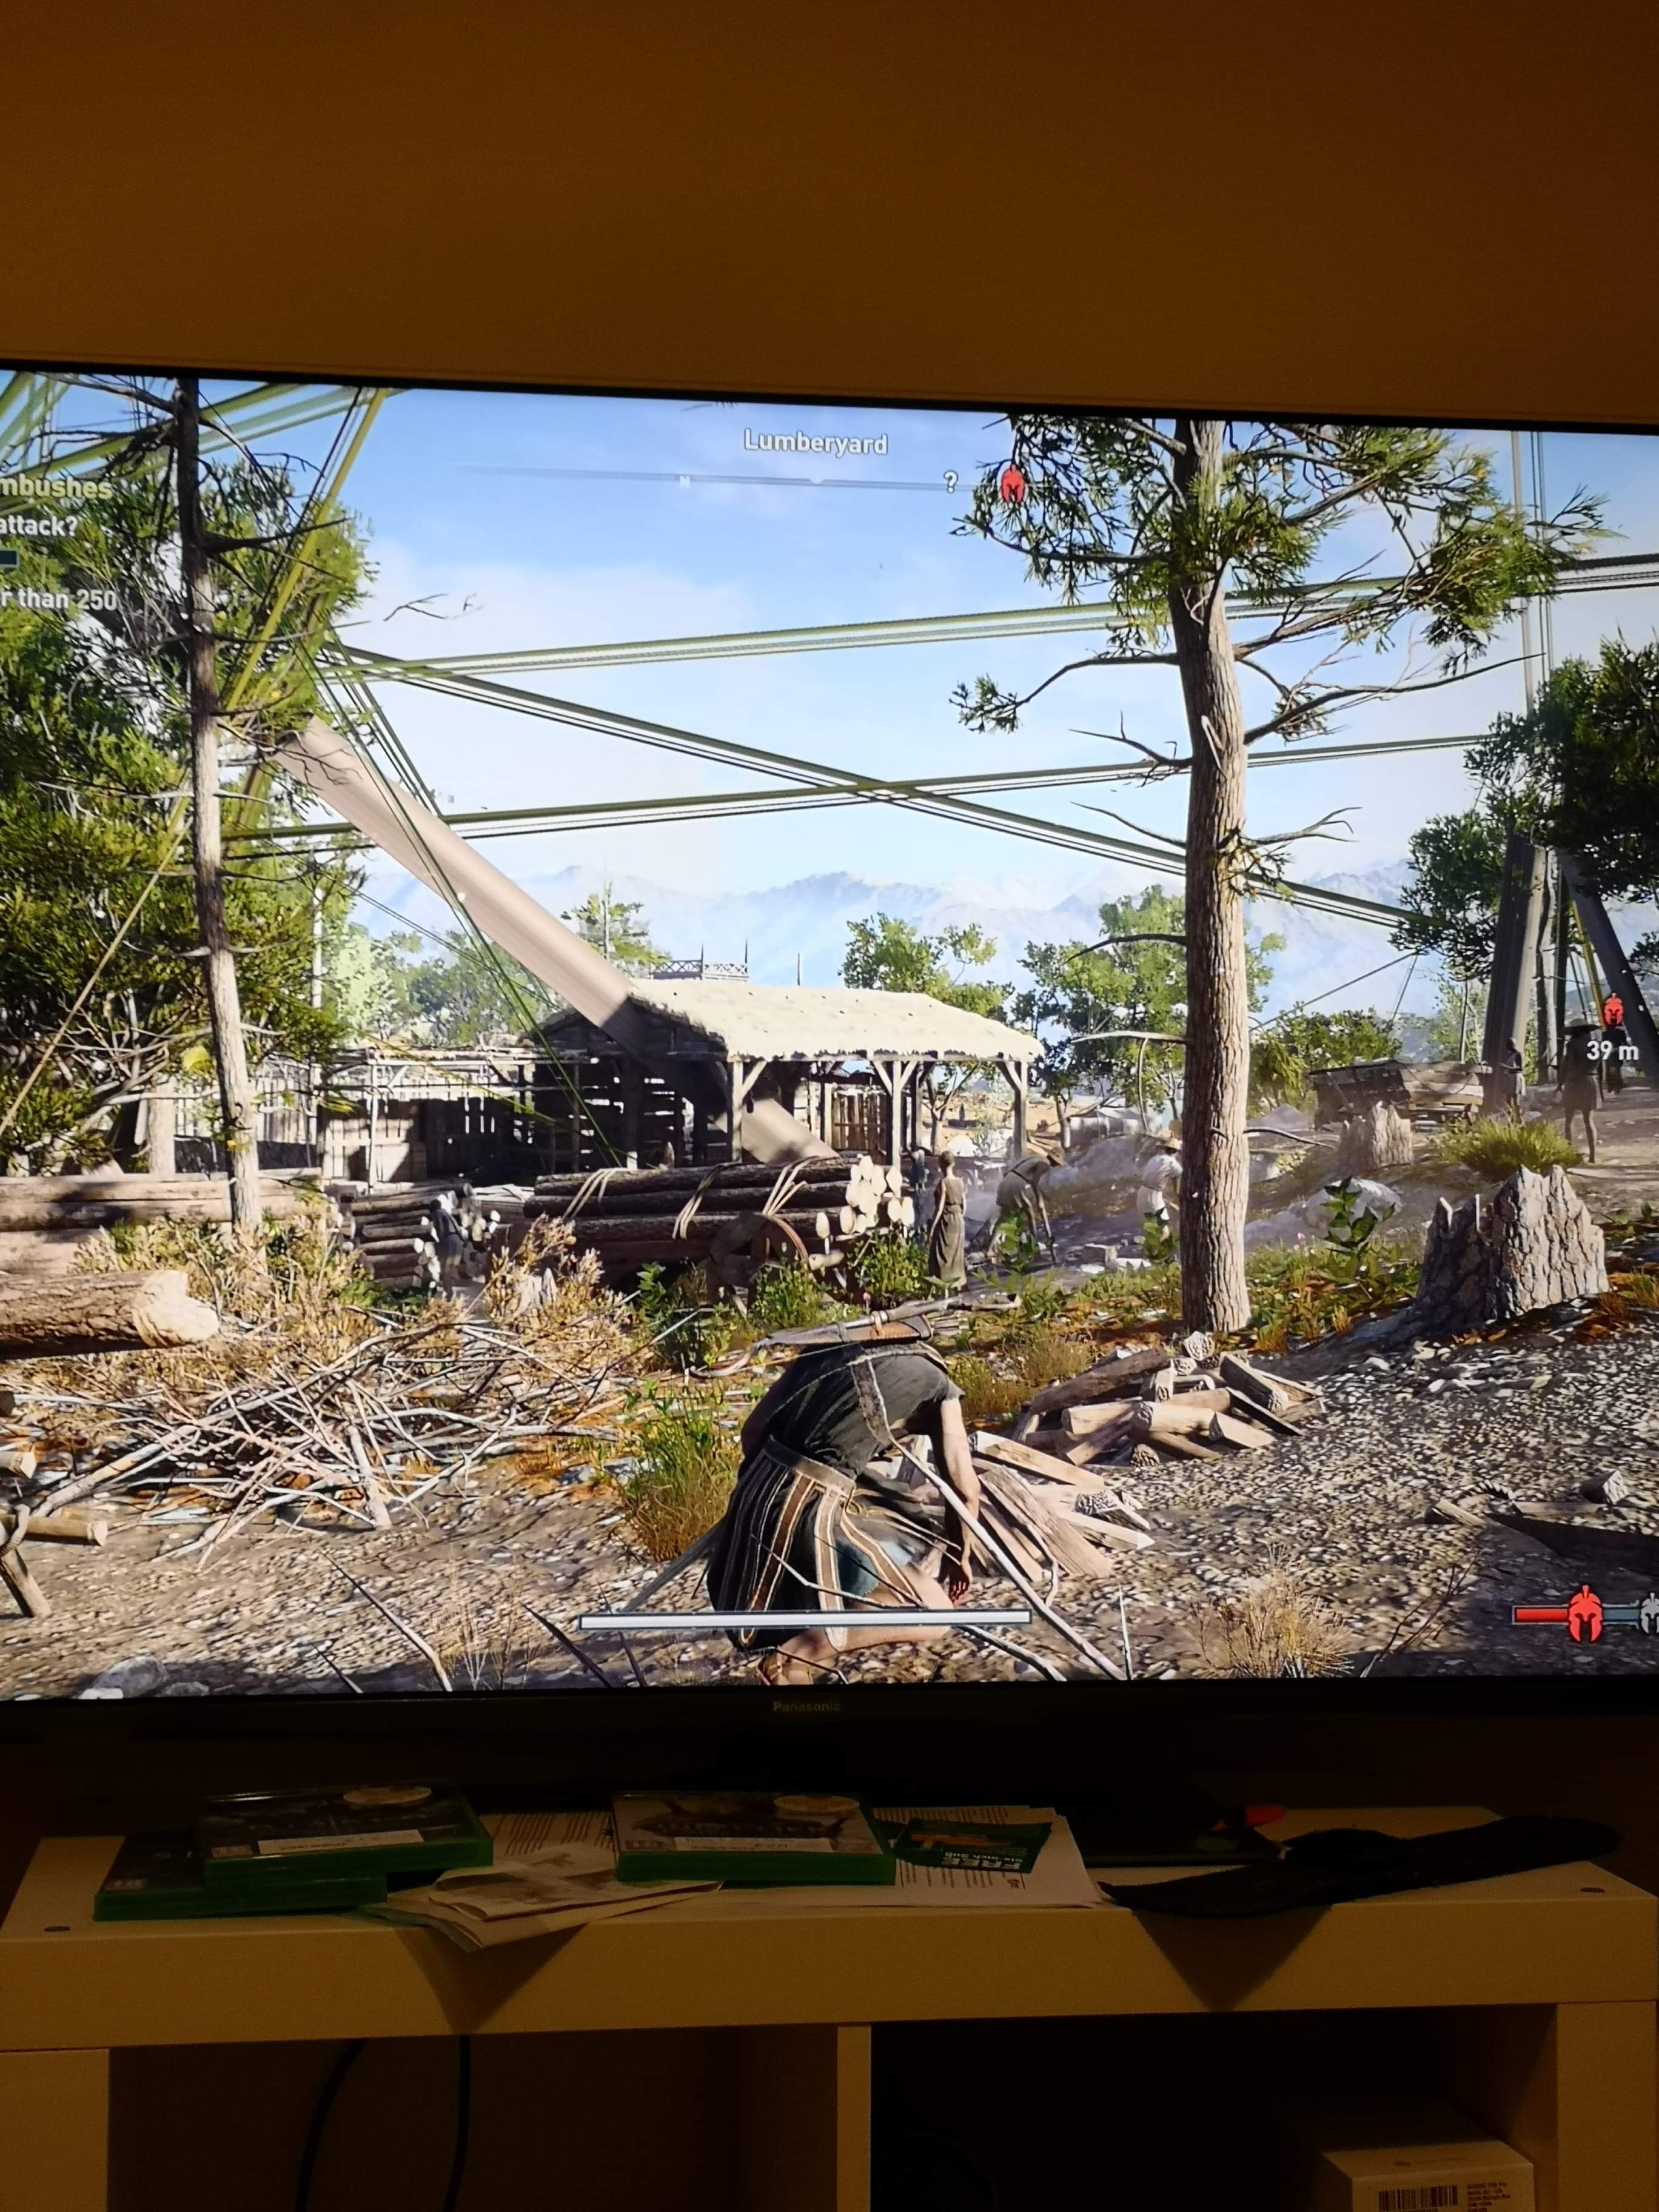 Assassin's Creed Odyssey Graphic glitch - Microsoft Community